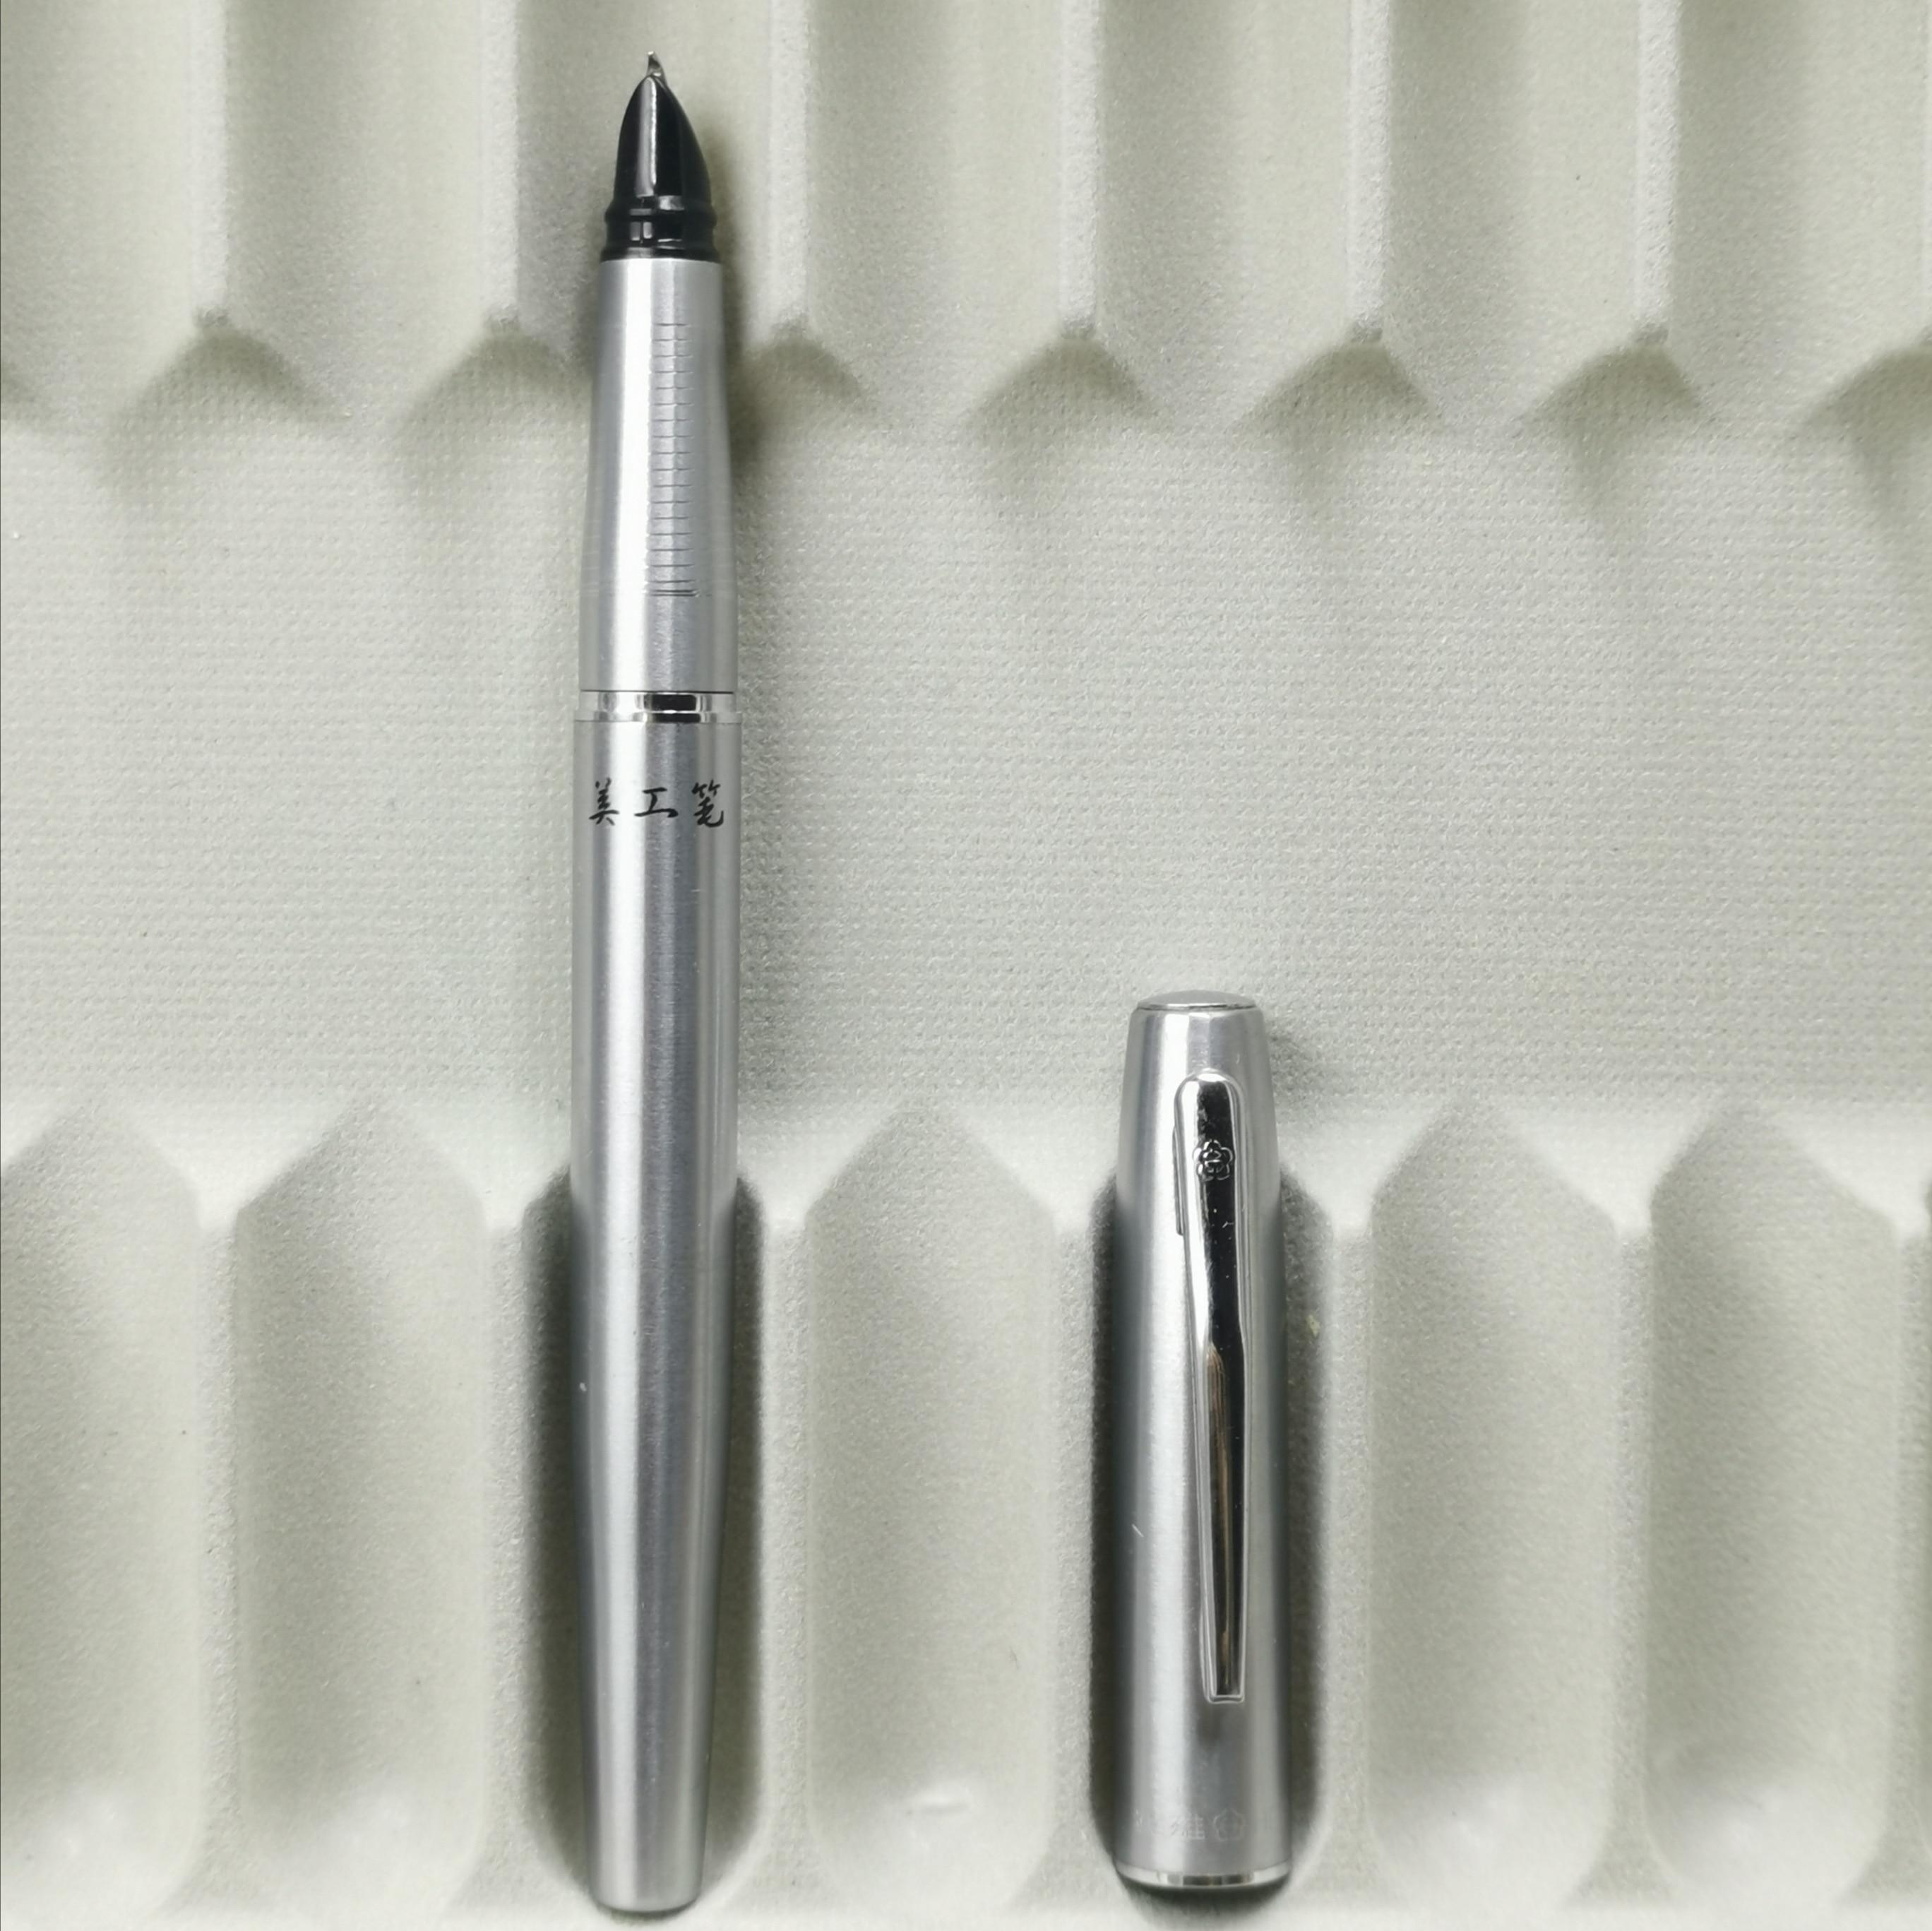 LBT Long Tail Fountain Pen EF//F//M//1.1mm//1.5mm//1.9mm Nibs Optional